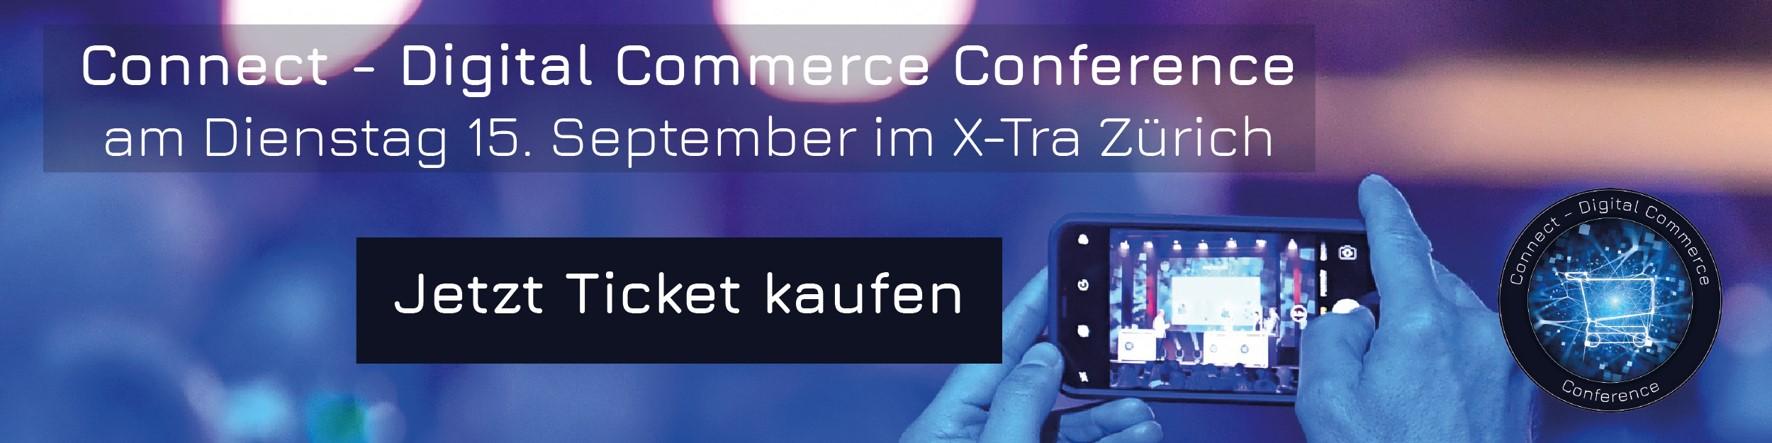 connect-banner-tickets-200915-newsletter